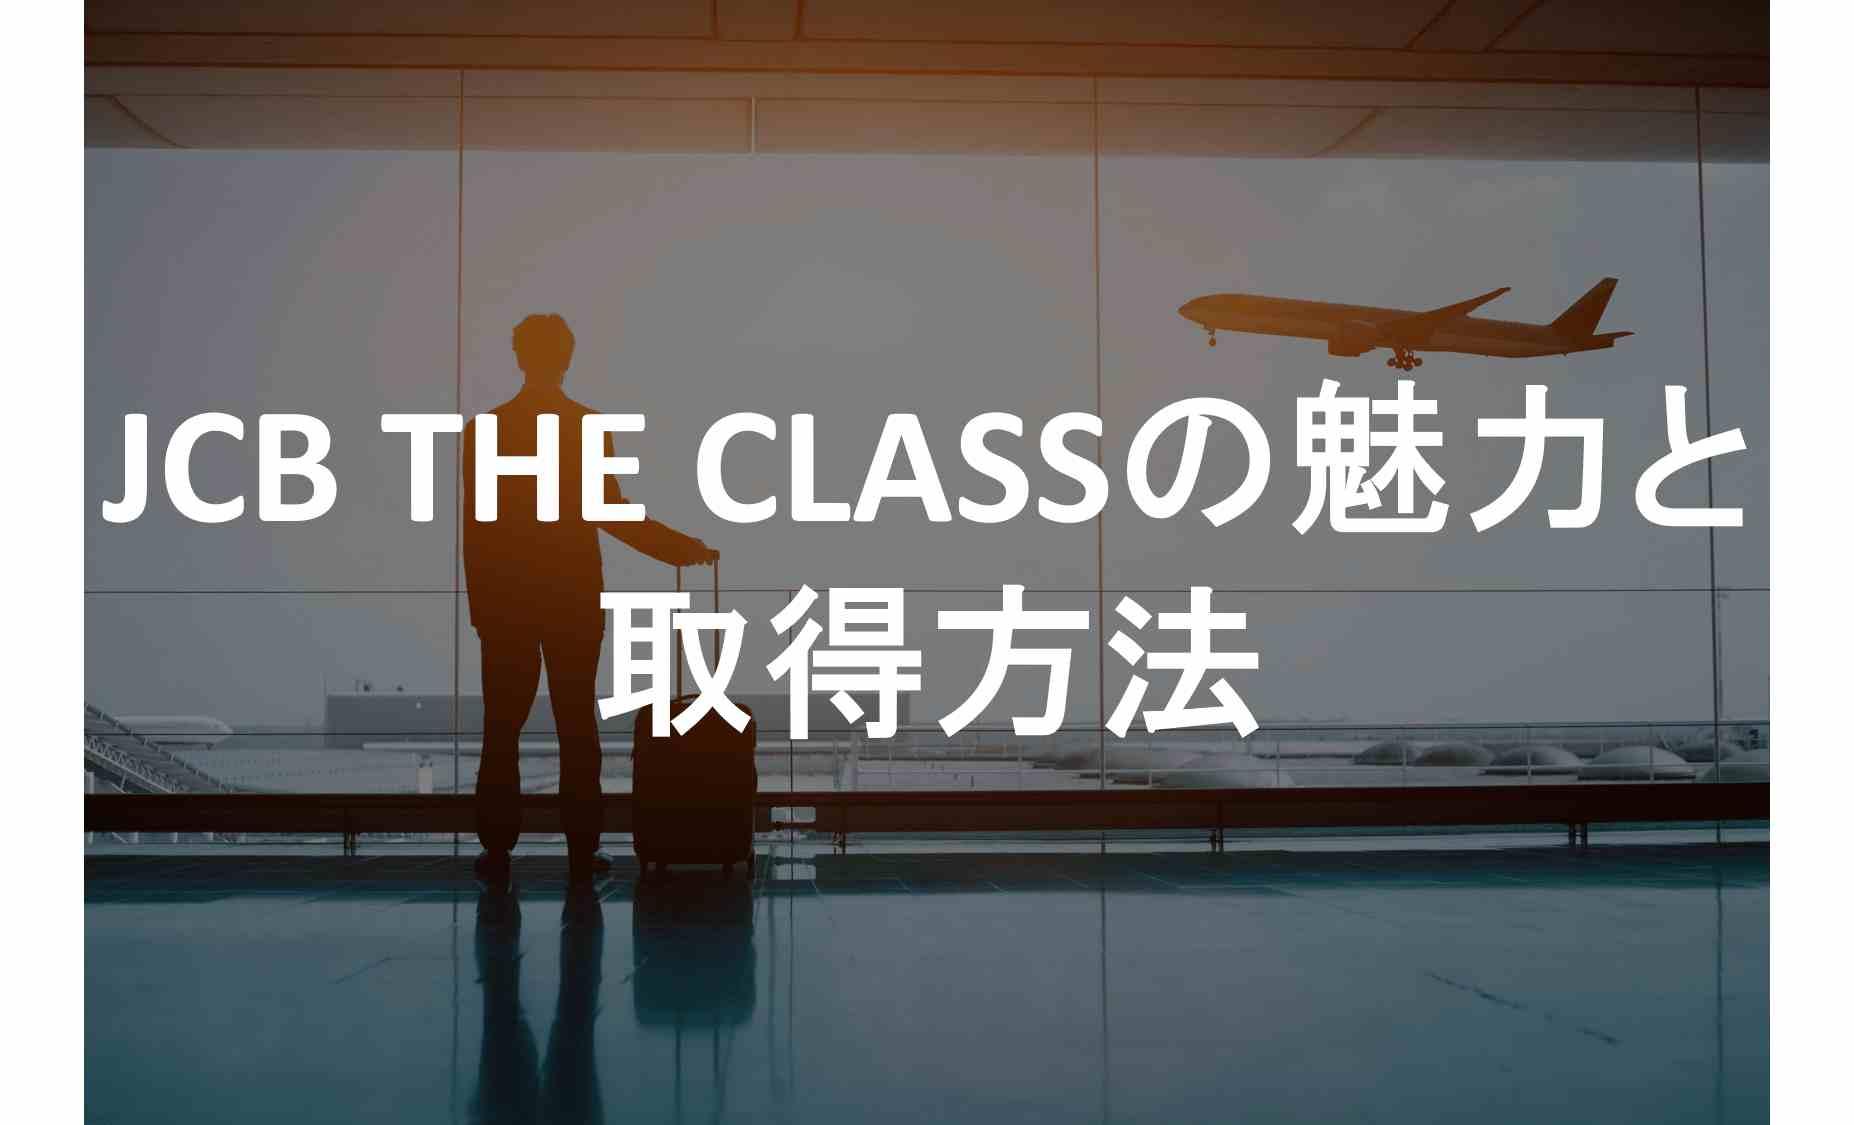 JCB THE CLASS 取得方法